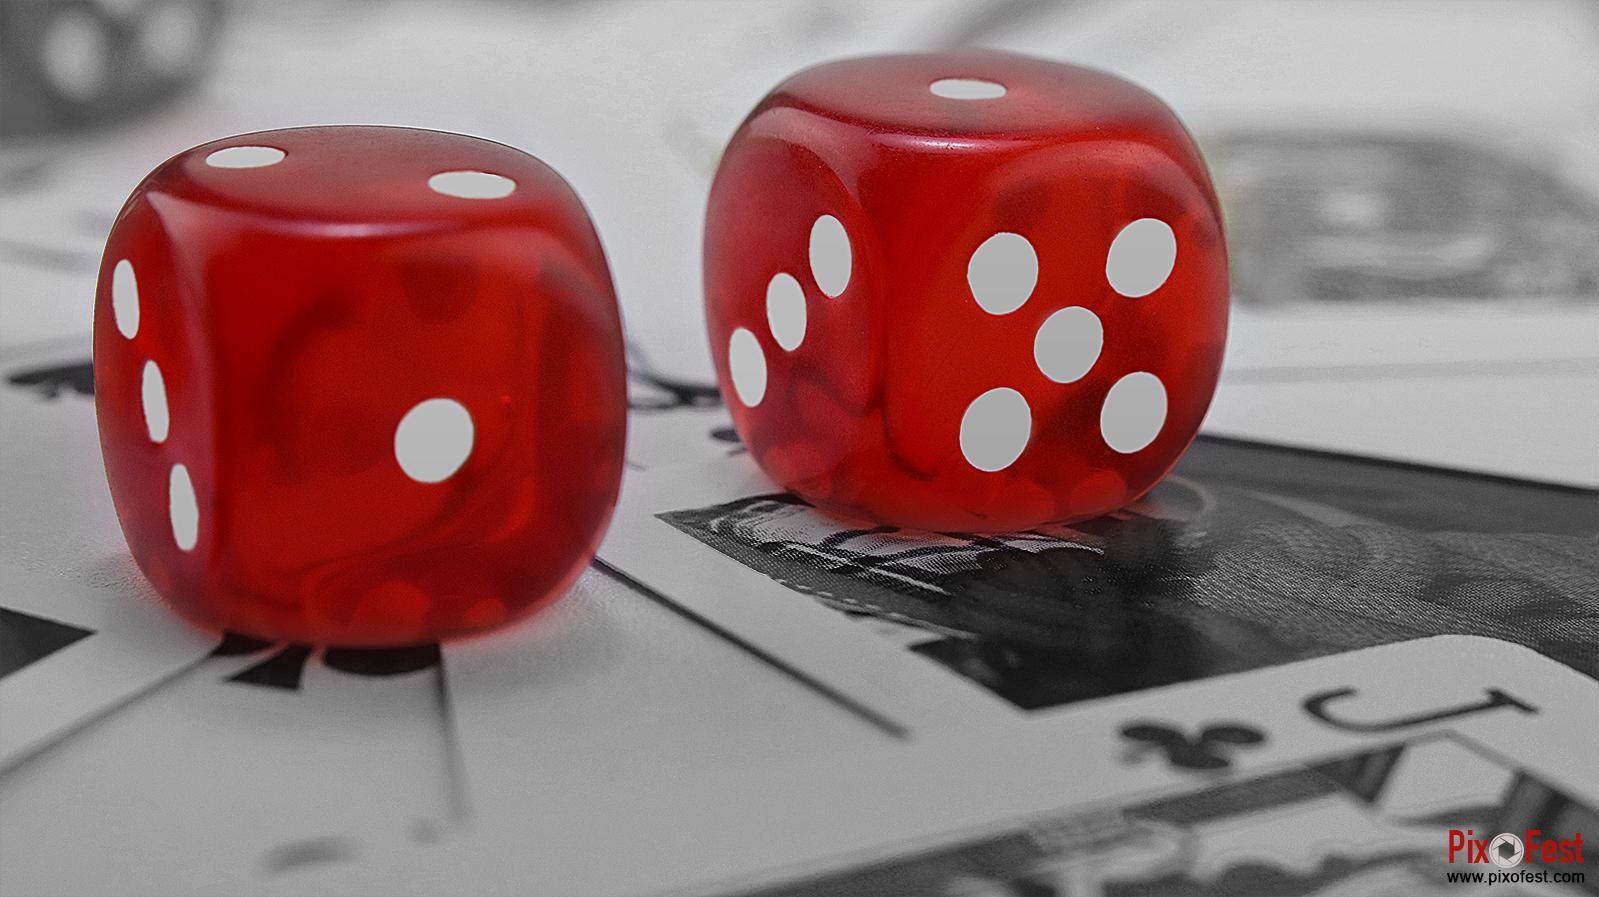 diceimage,dicepicture,dice,cube,cubeimage,cubepicture,cube wallpaper,red dice,dicewithcard,dicewithplayingcard,blackandwhite,pixofest